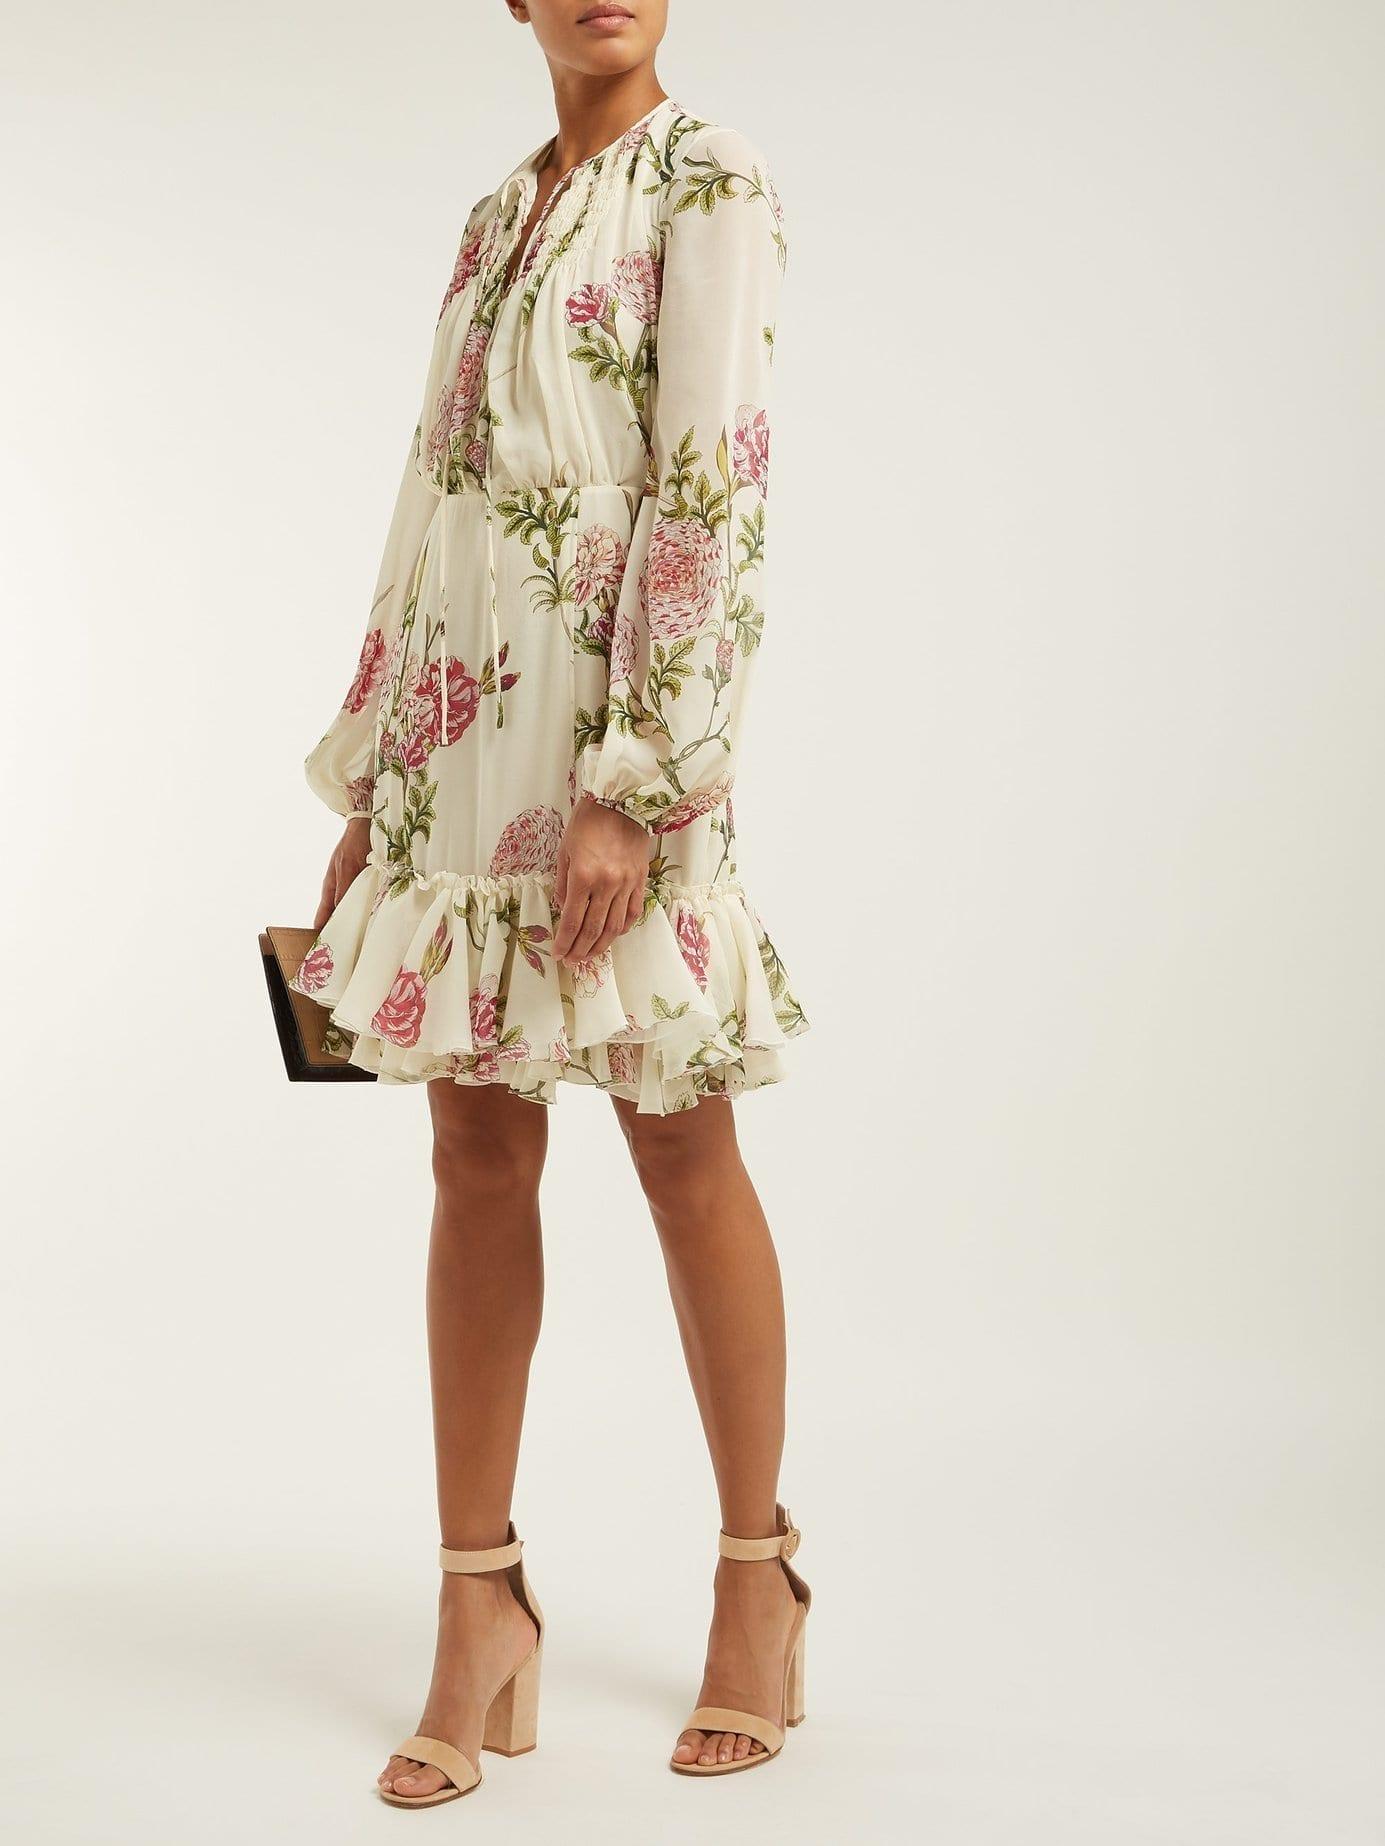 2cfe2fdd1f55 GIAMBATTISTA VALLI Peony Print Silk Chiffon Midi Ivory Dress - We ...